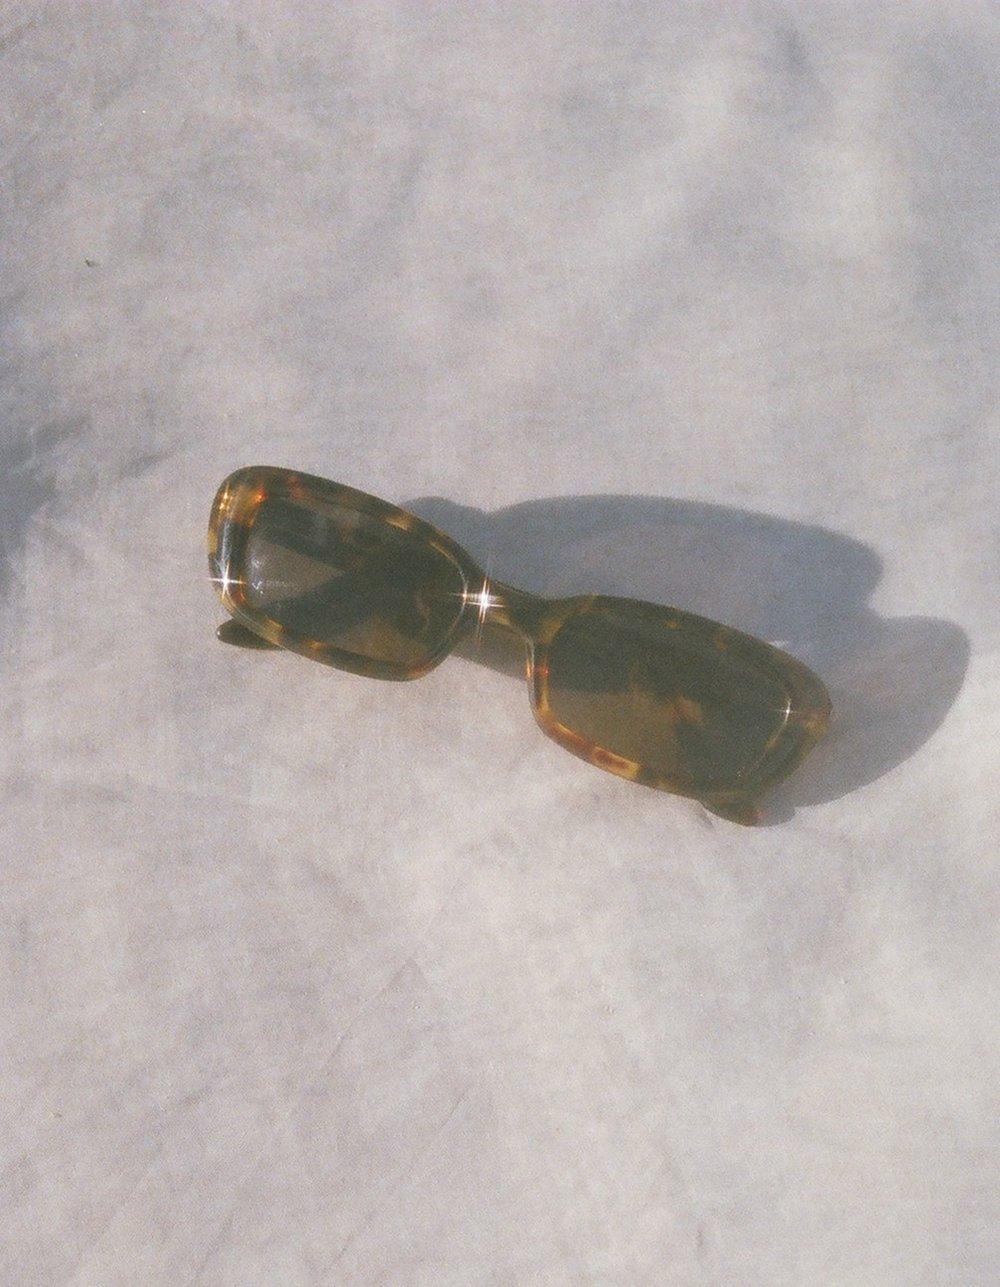 gucci tortoise sunglasses 1.jpg